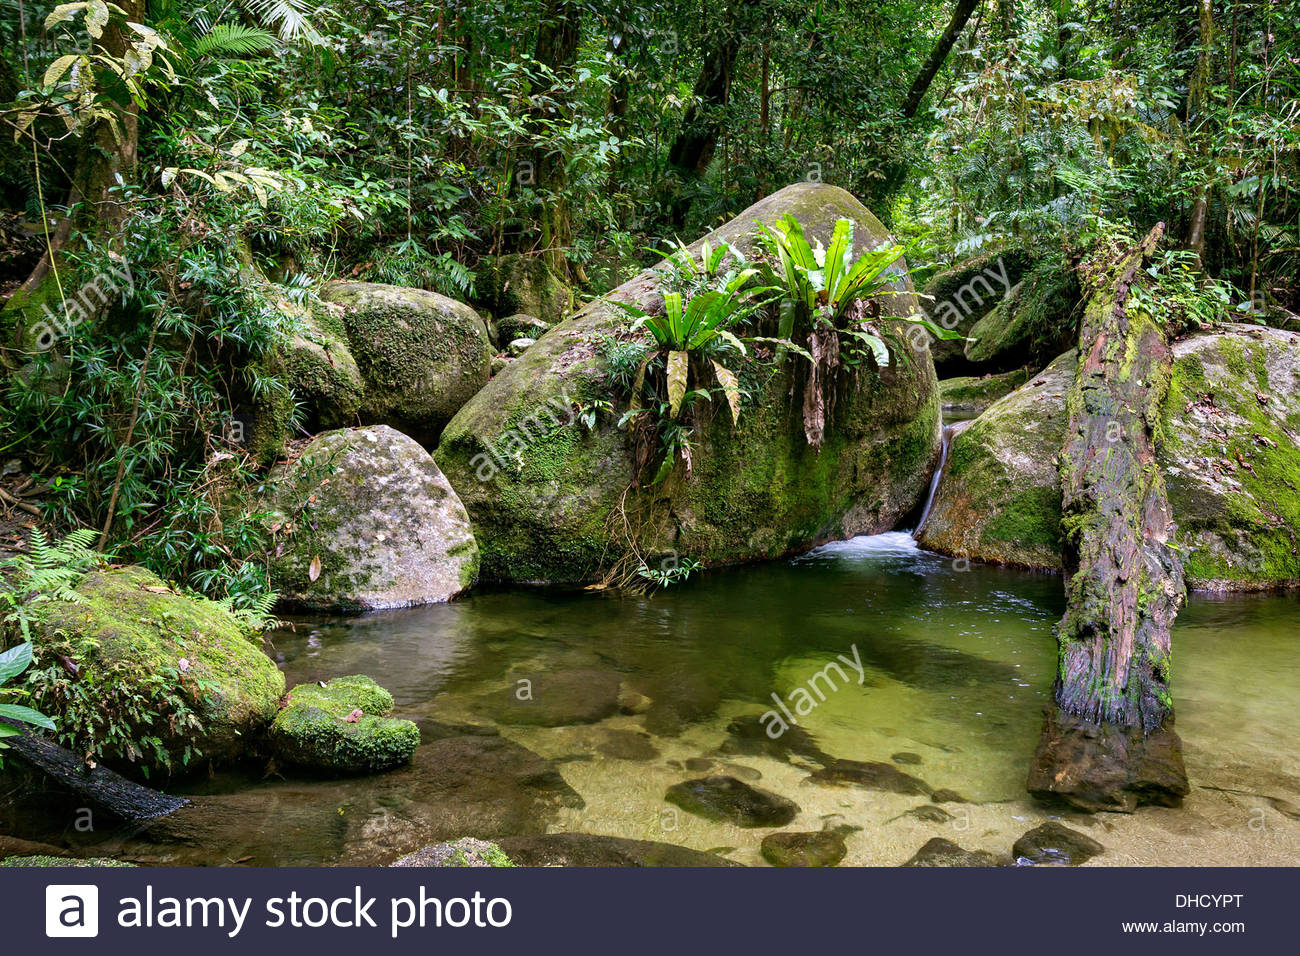 mossman-gorge-queensland-australia-DHCYP